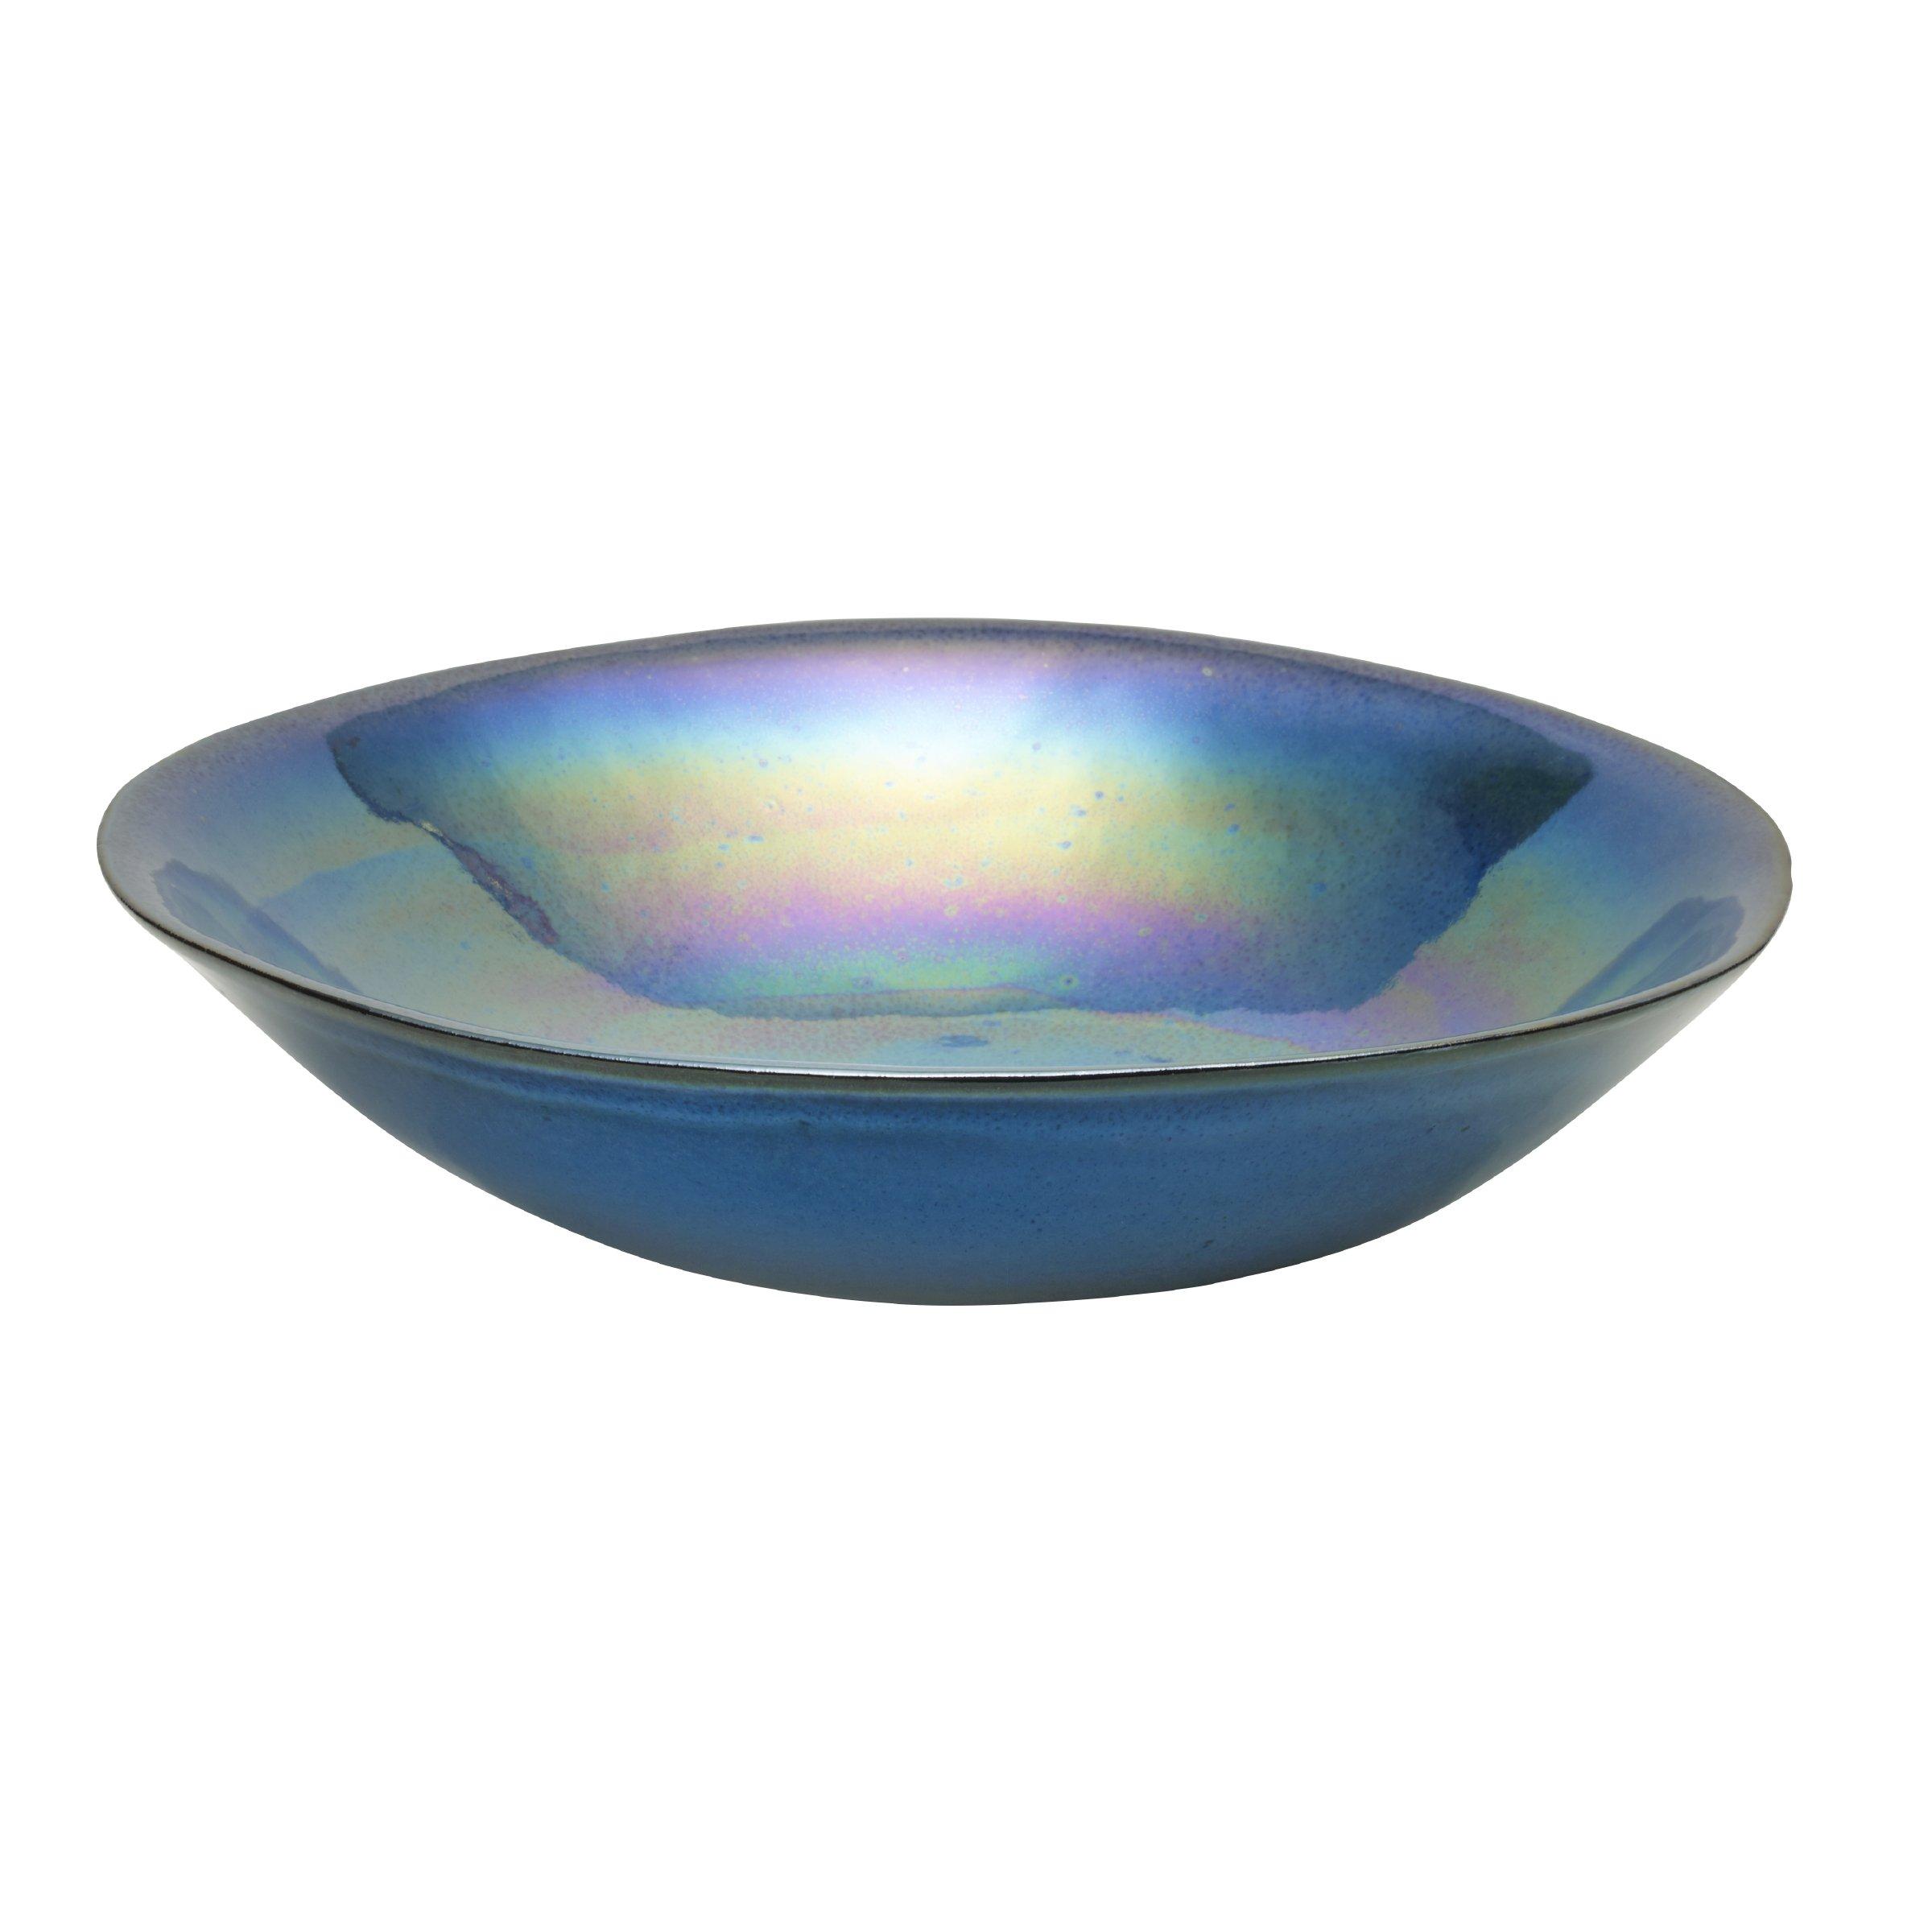 Mikasa Coronado Vegetable Bowl, 11.75-Inch, Cobalt